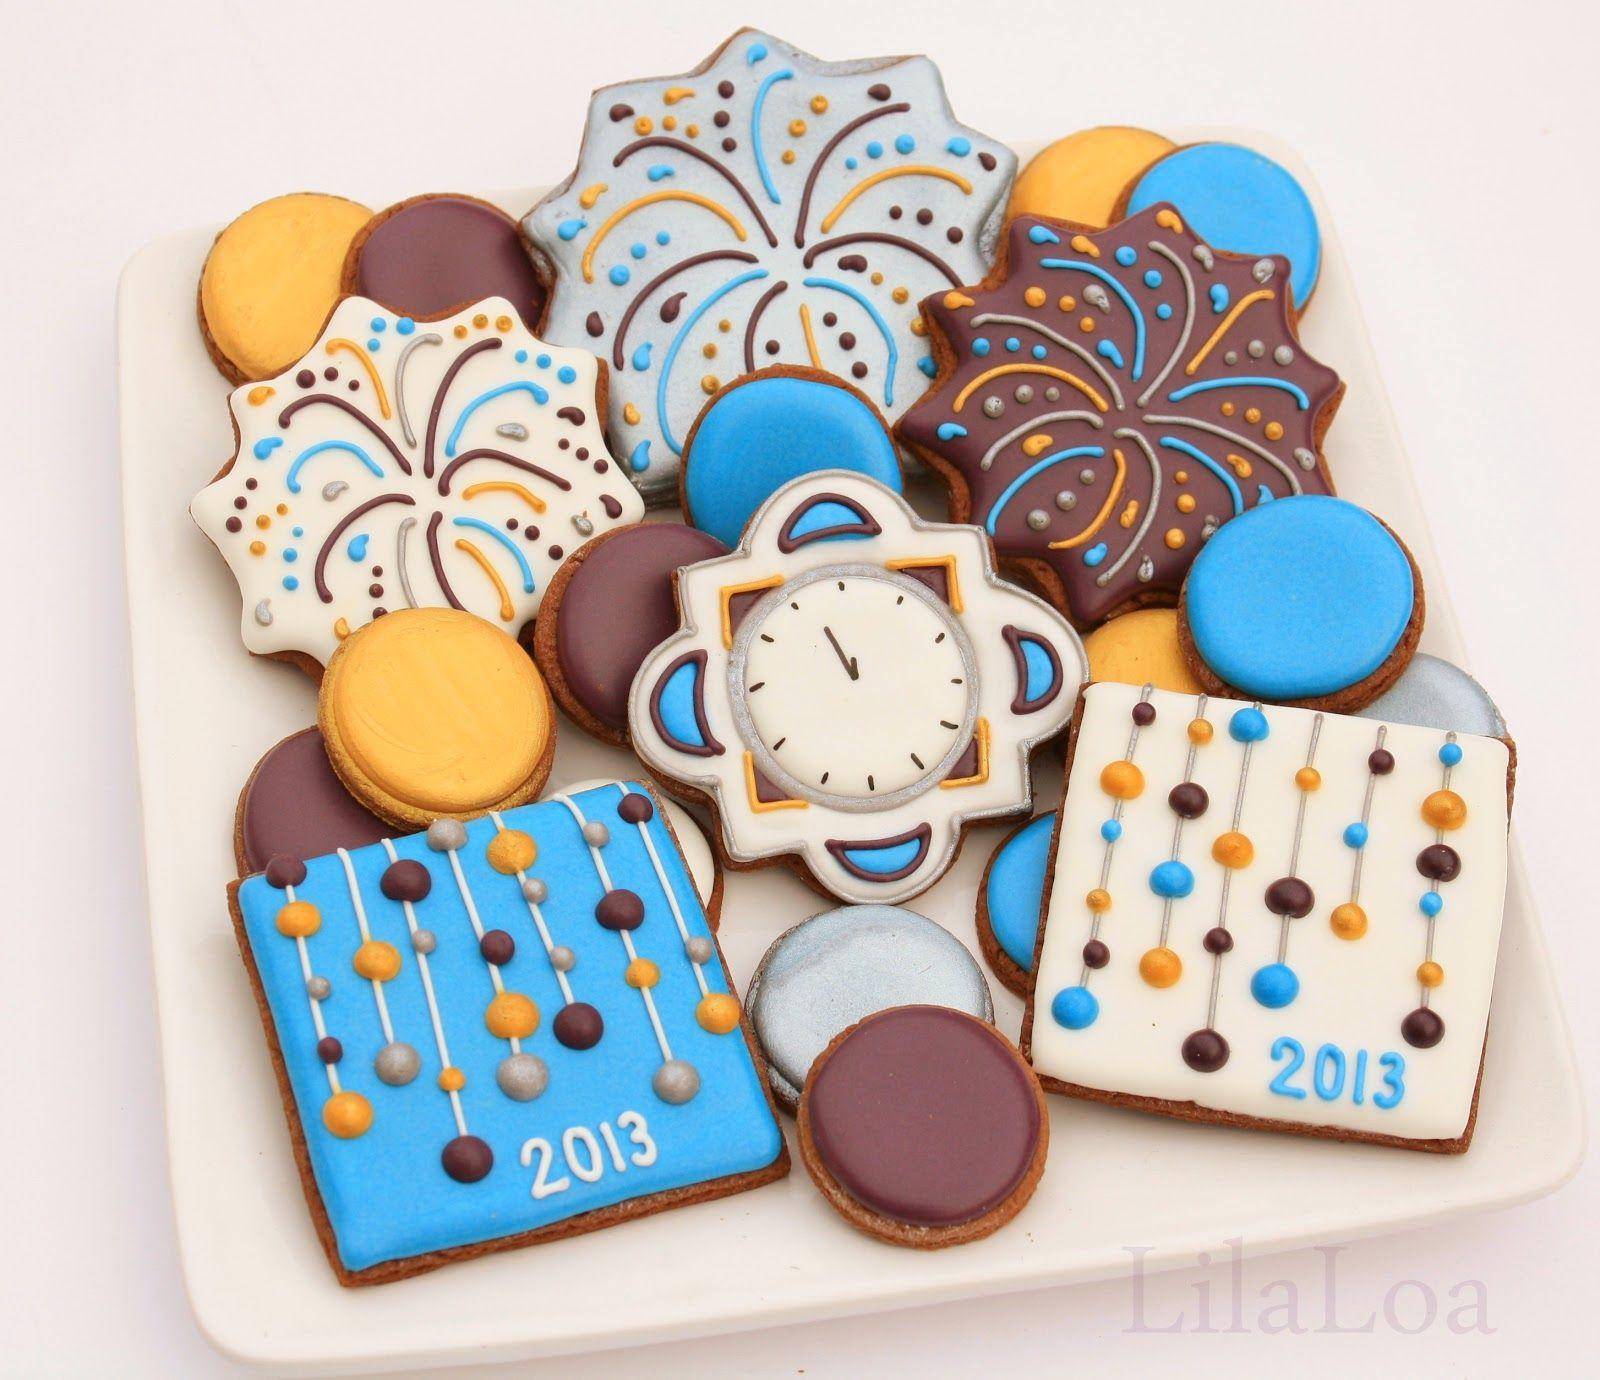 LilaLoa New Year's Eve Cookies has created